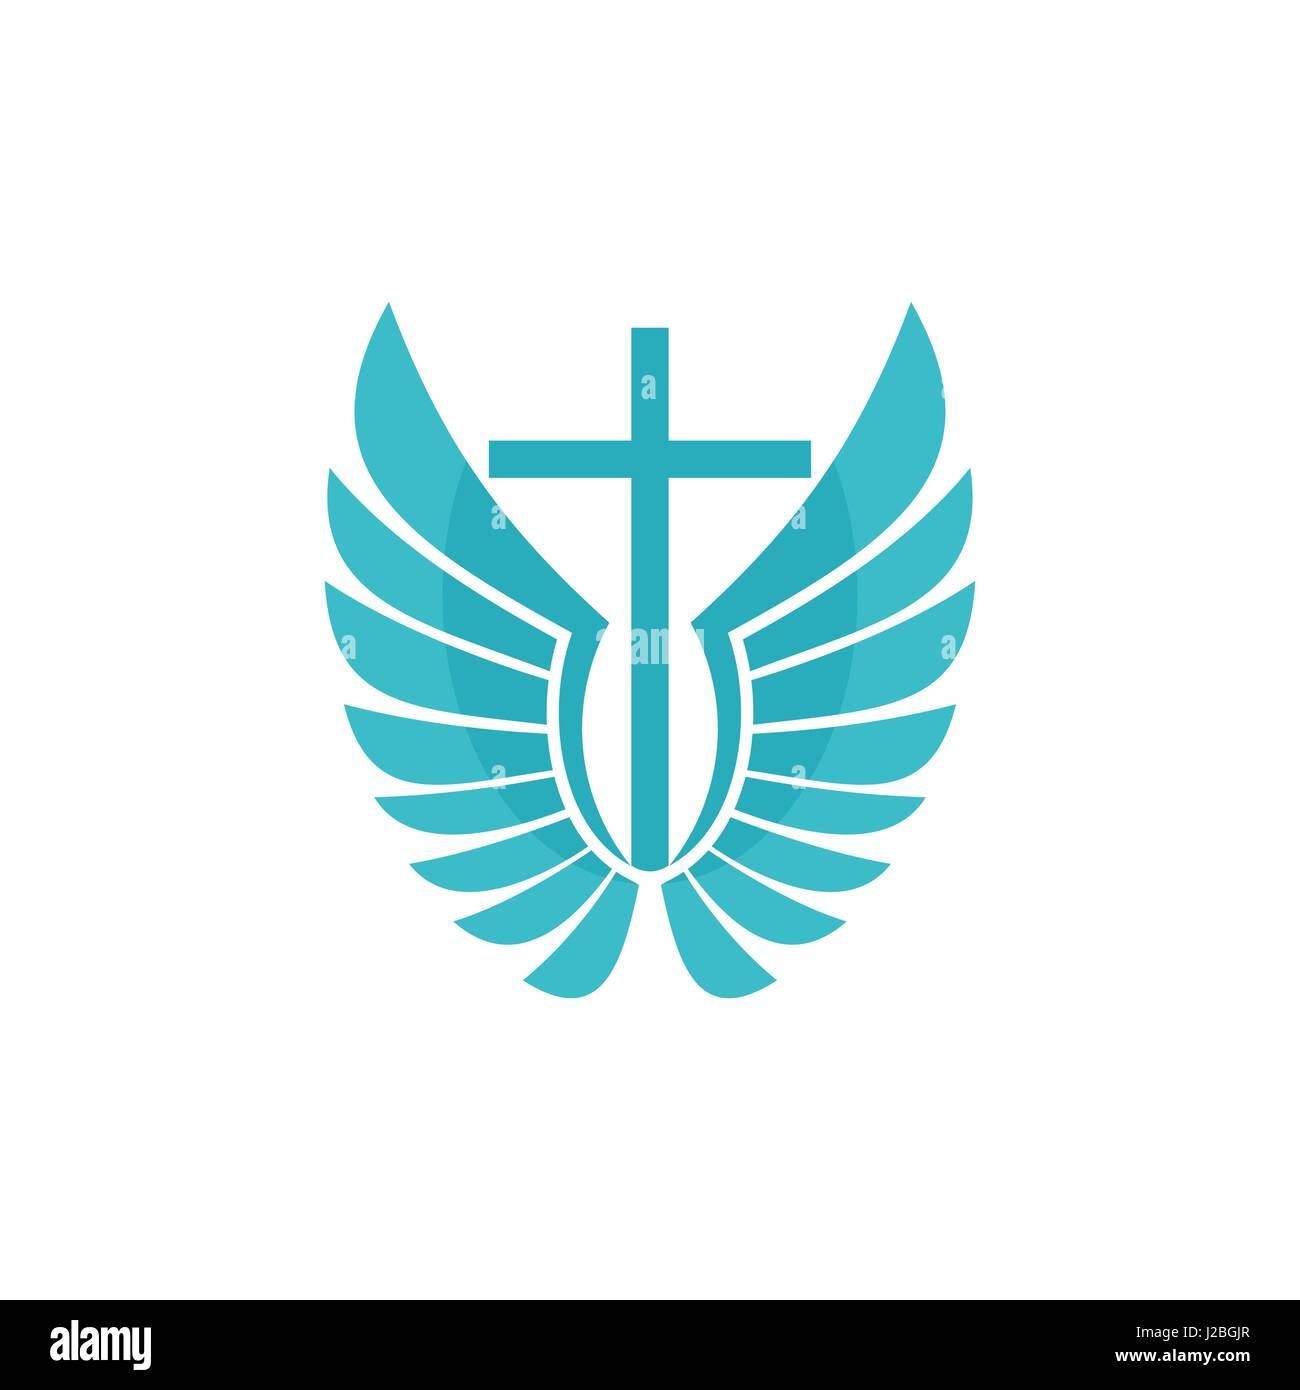 Church Logo Christian Symbols Cross And Wings